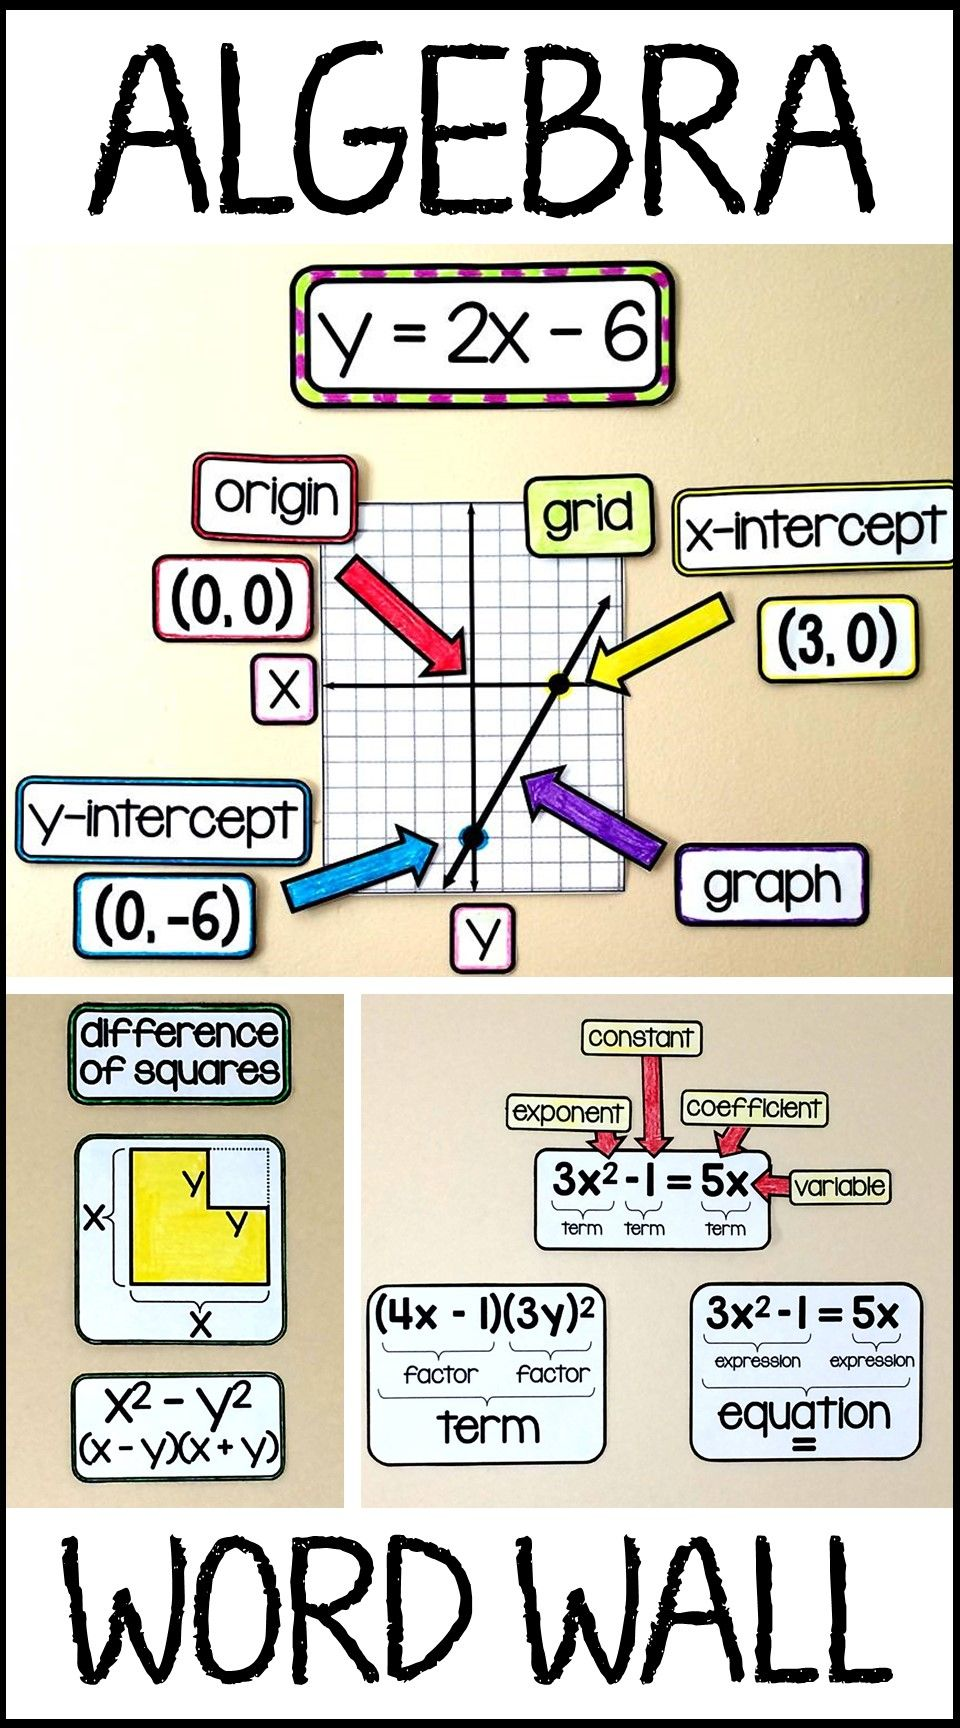 Algebra Word Wall Algebra Word Walls Math Word Walls Algebra